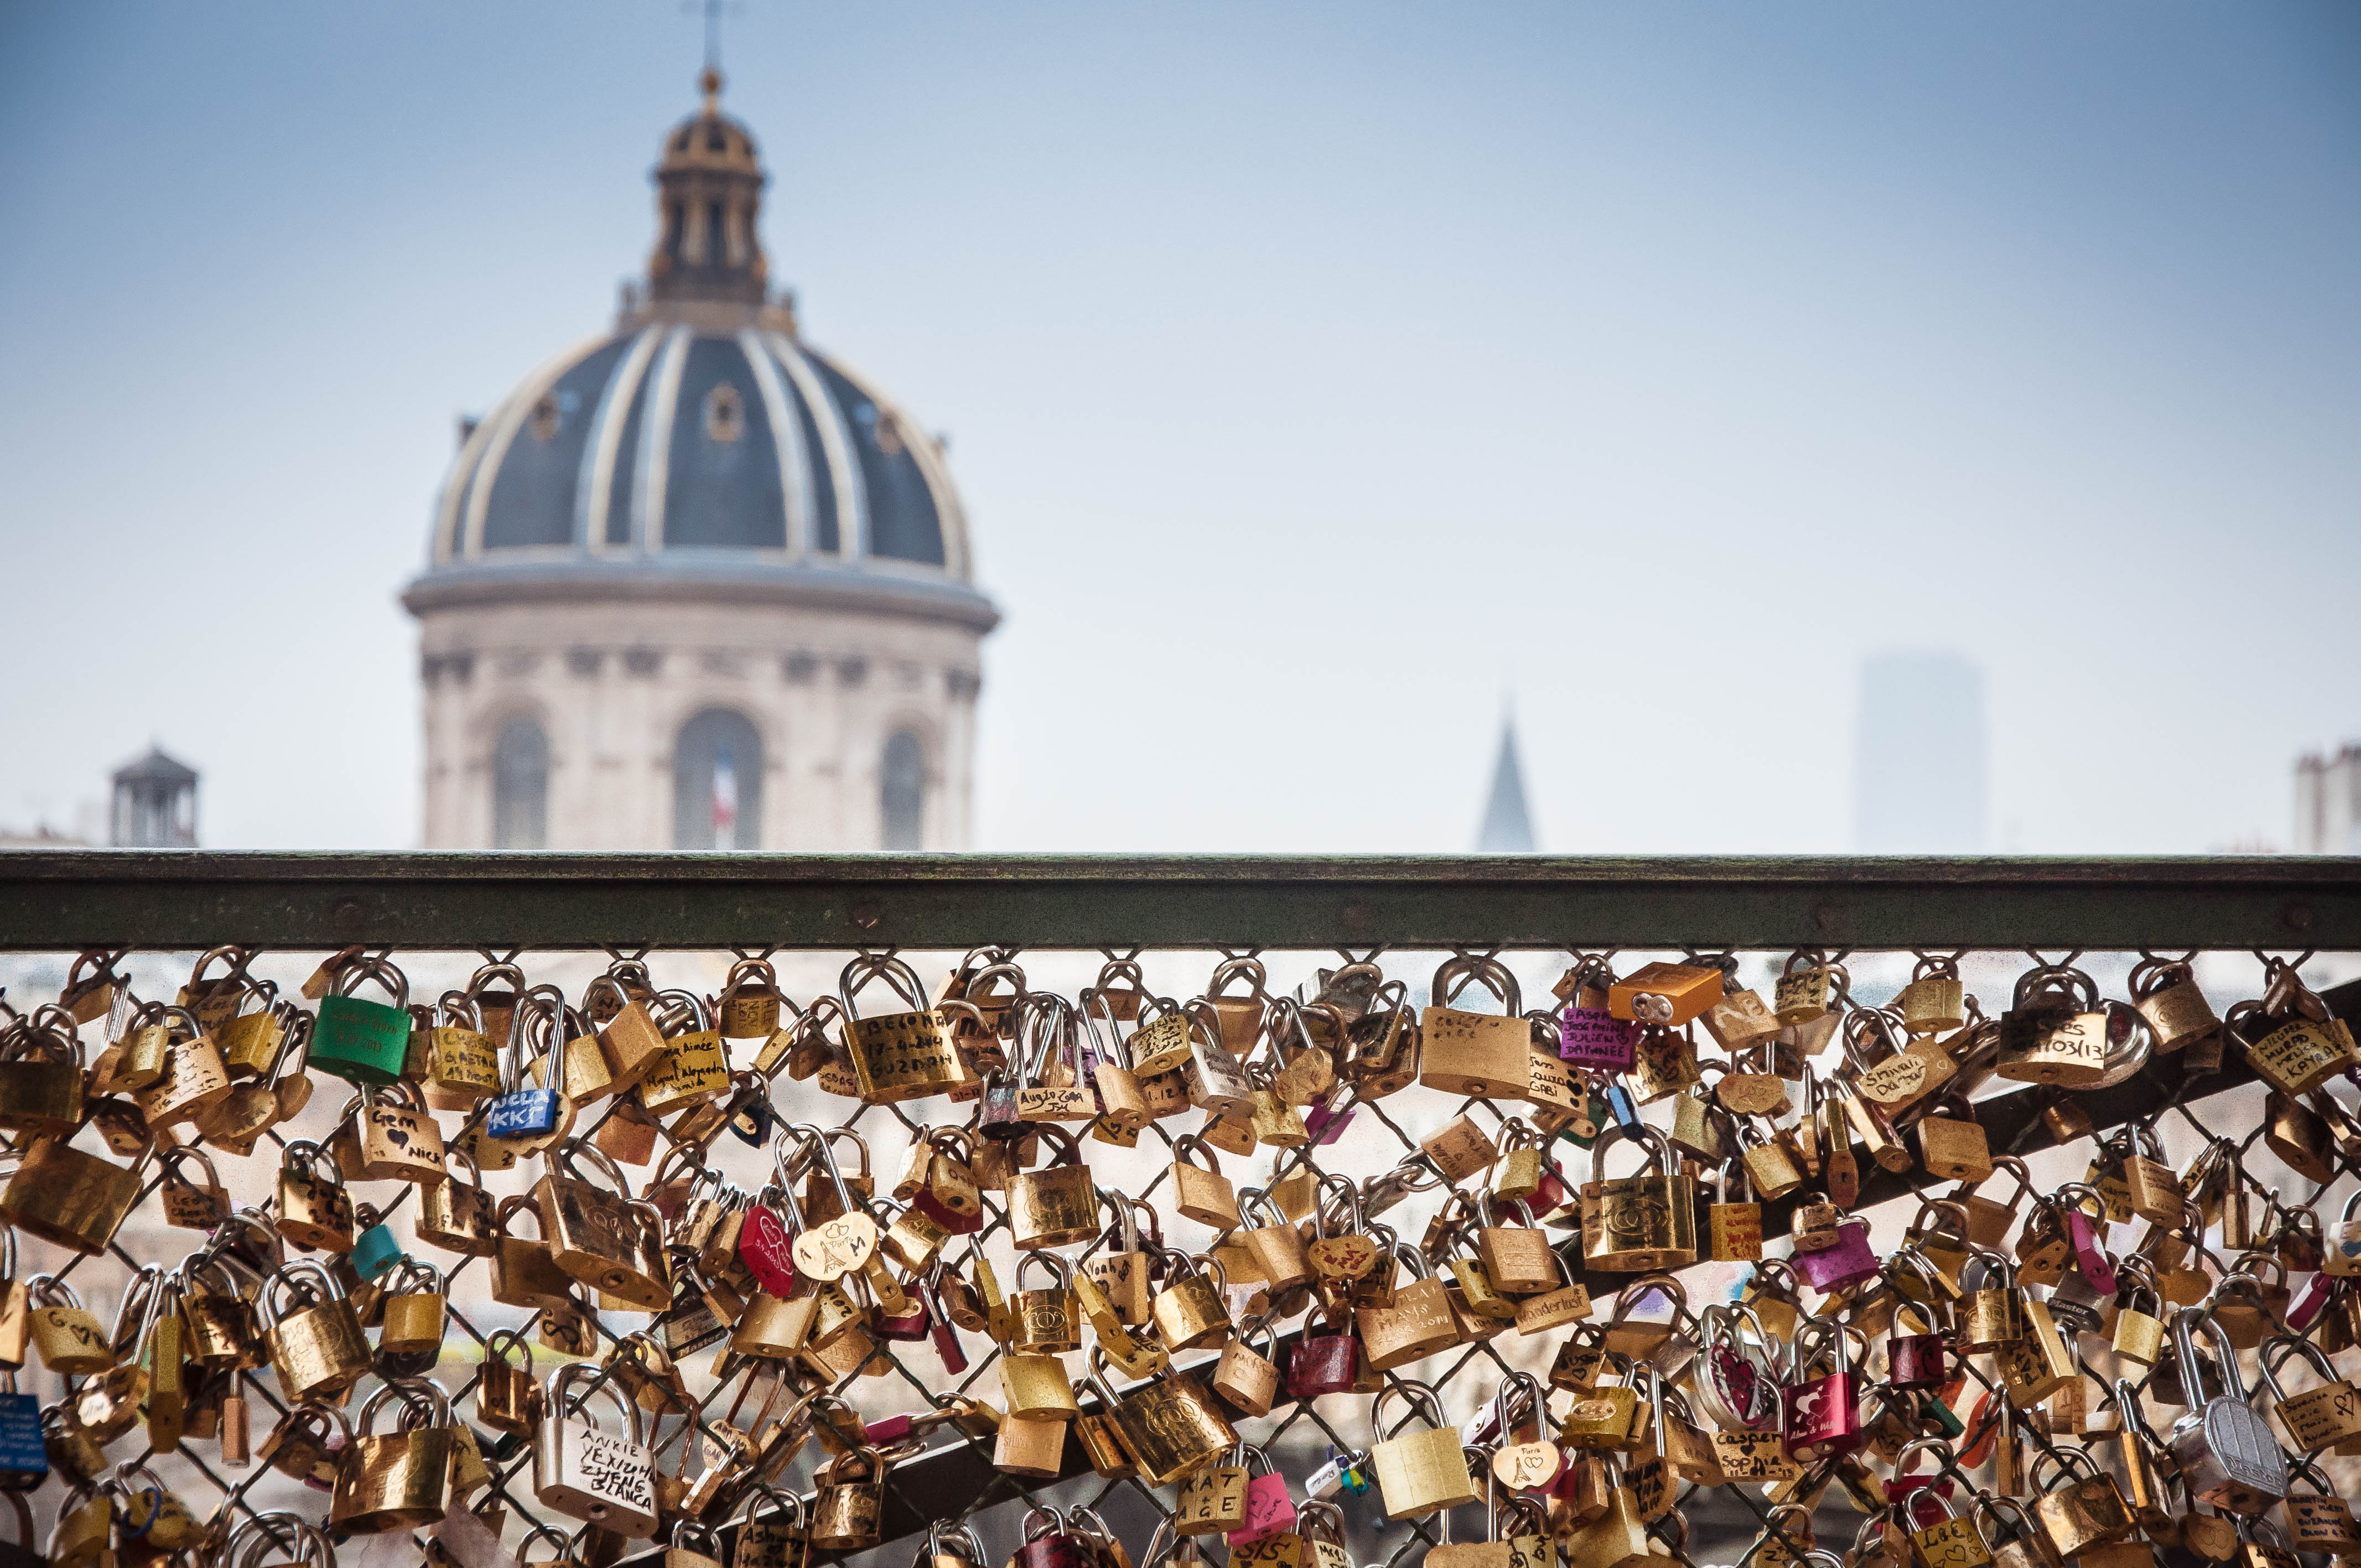 Flickr - Incatenarmi a Parigi